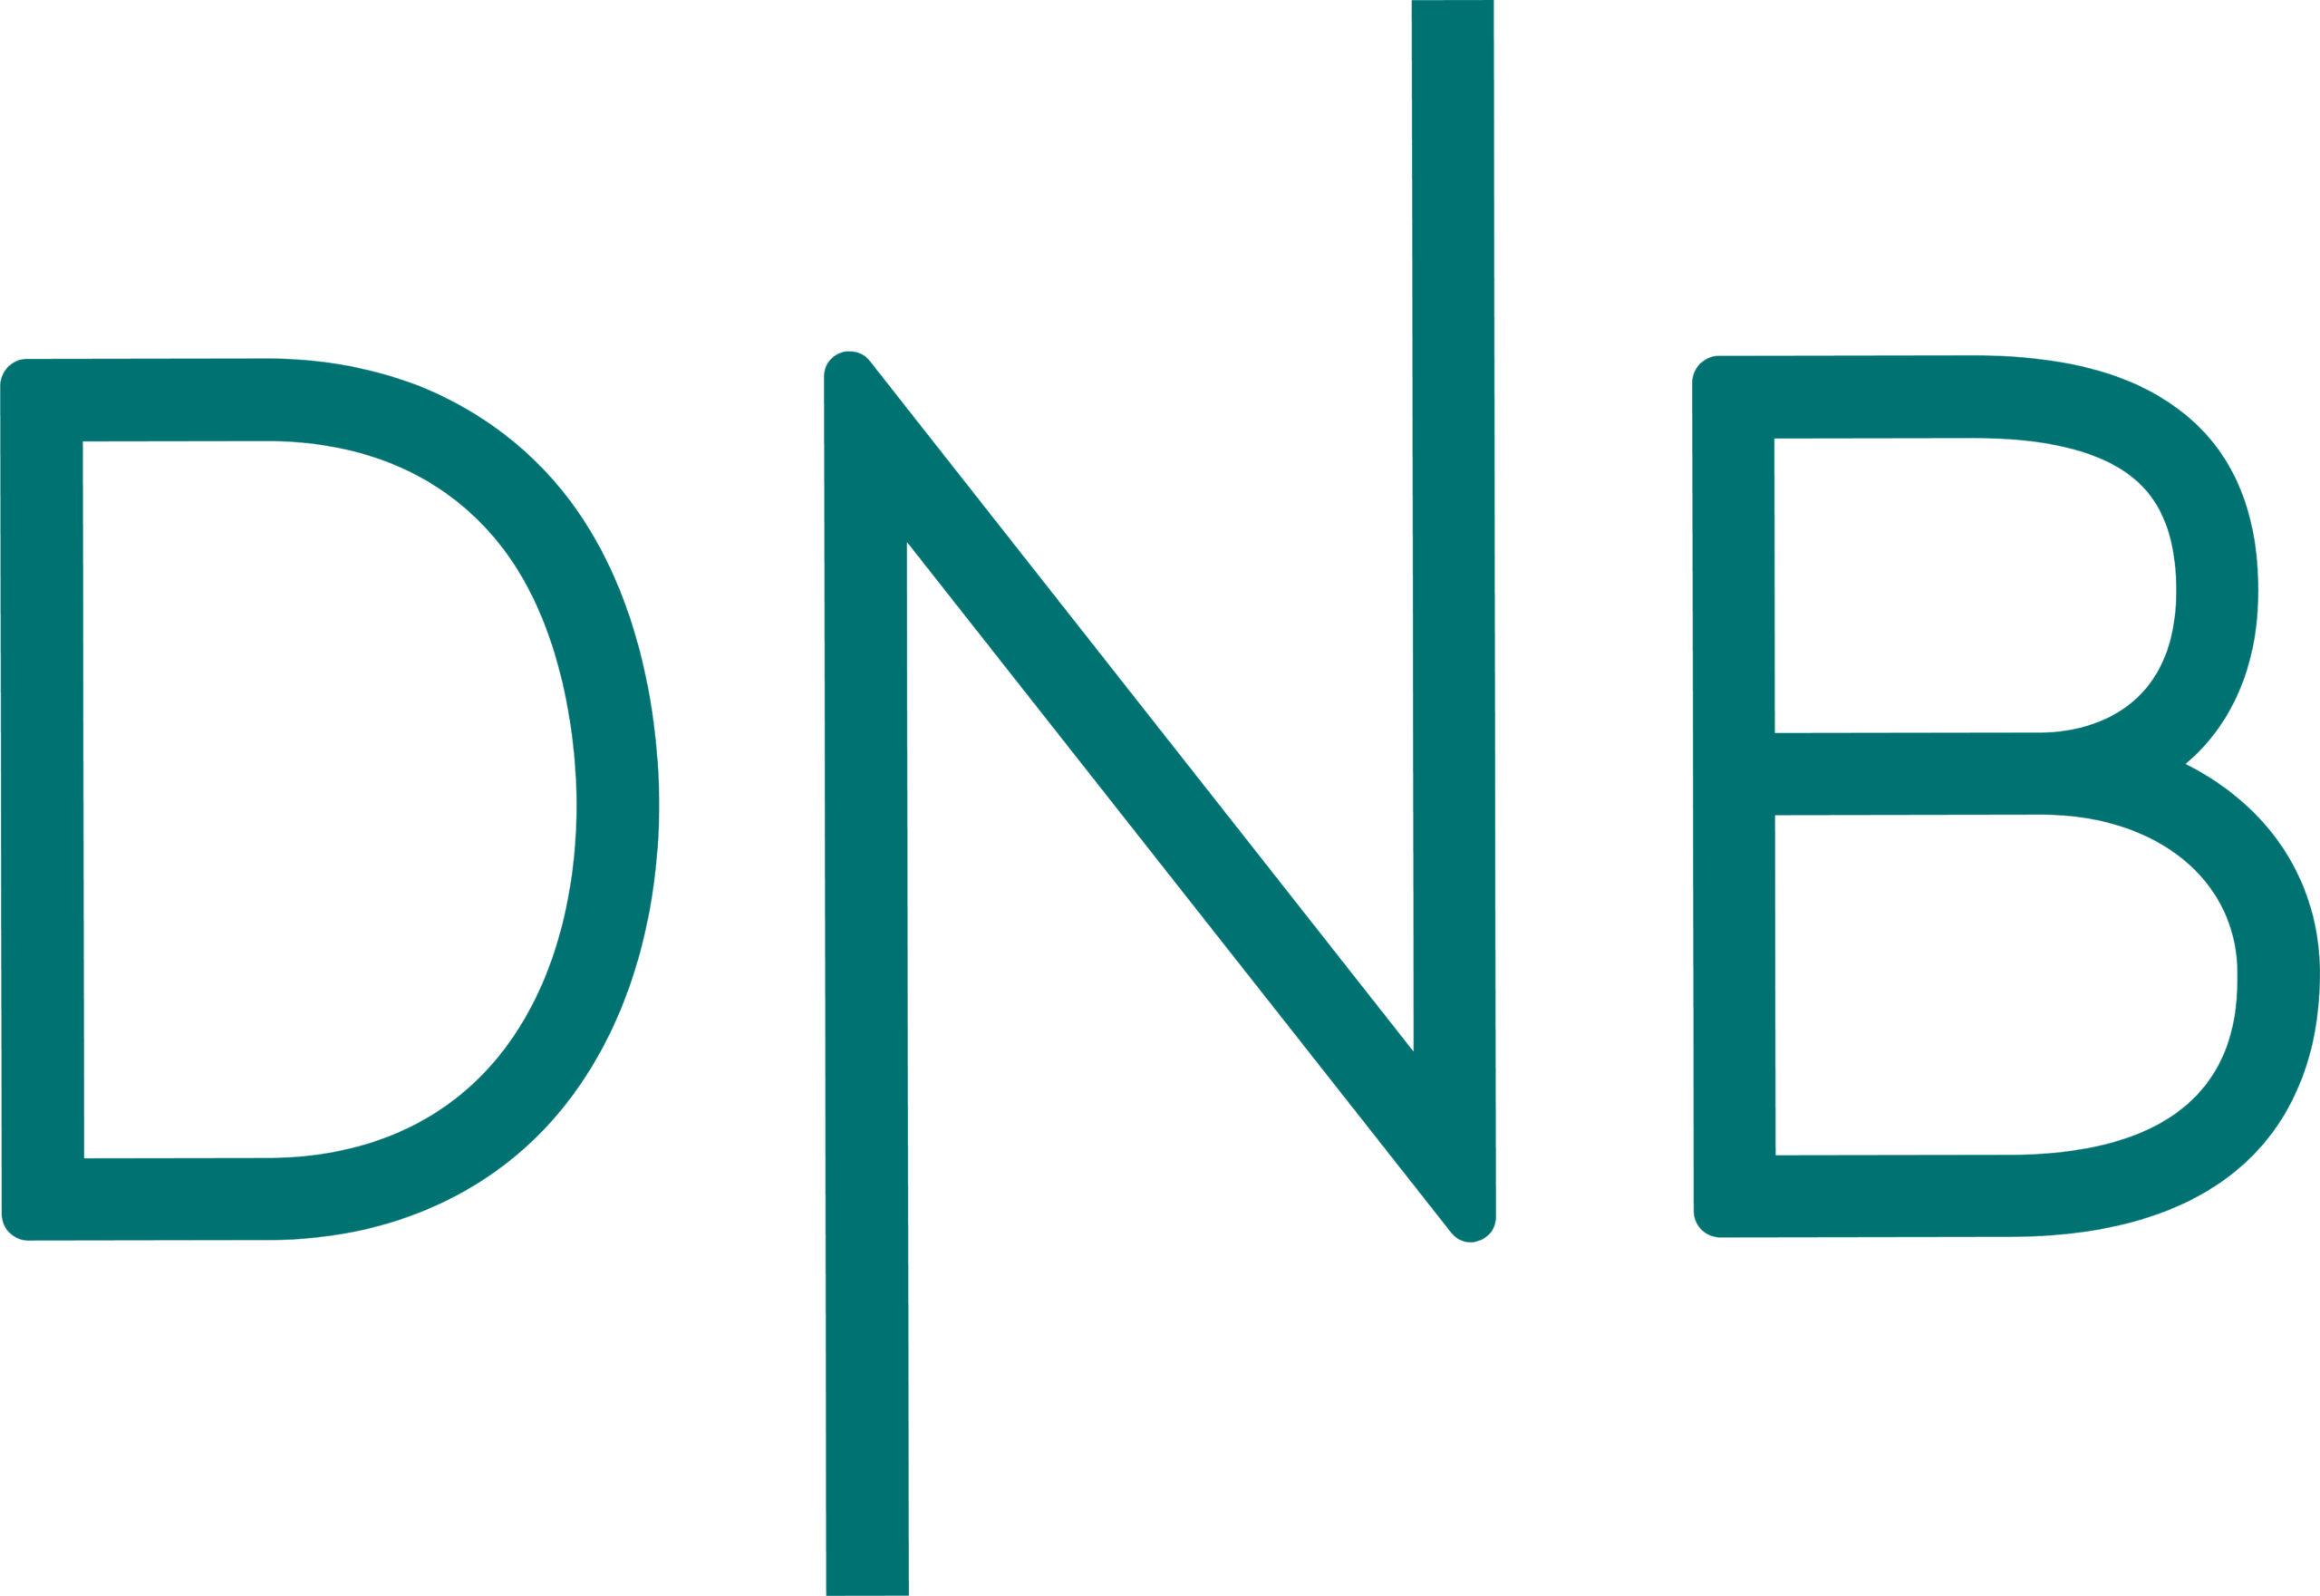 DnB sin logo i sjøgrønn